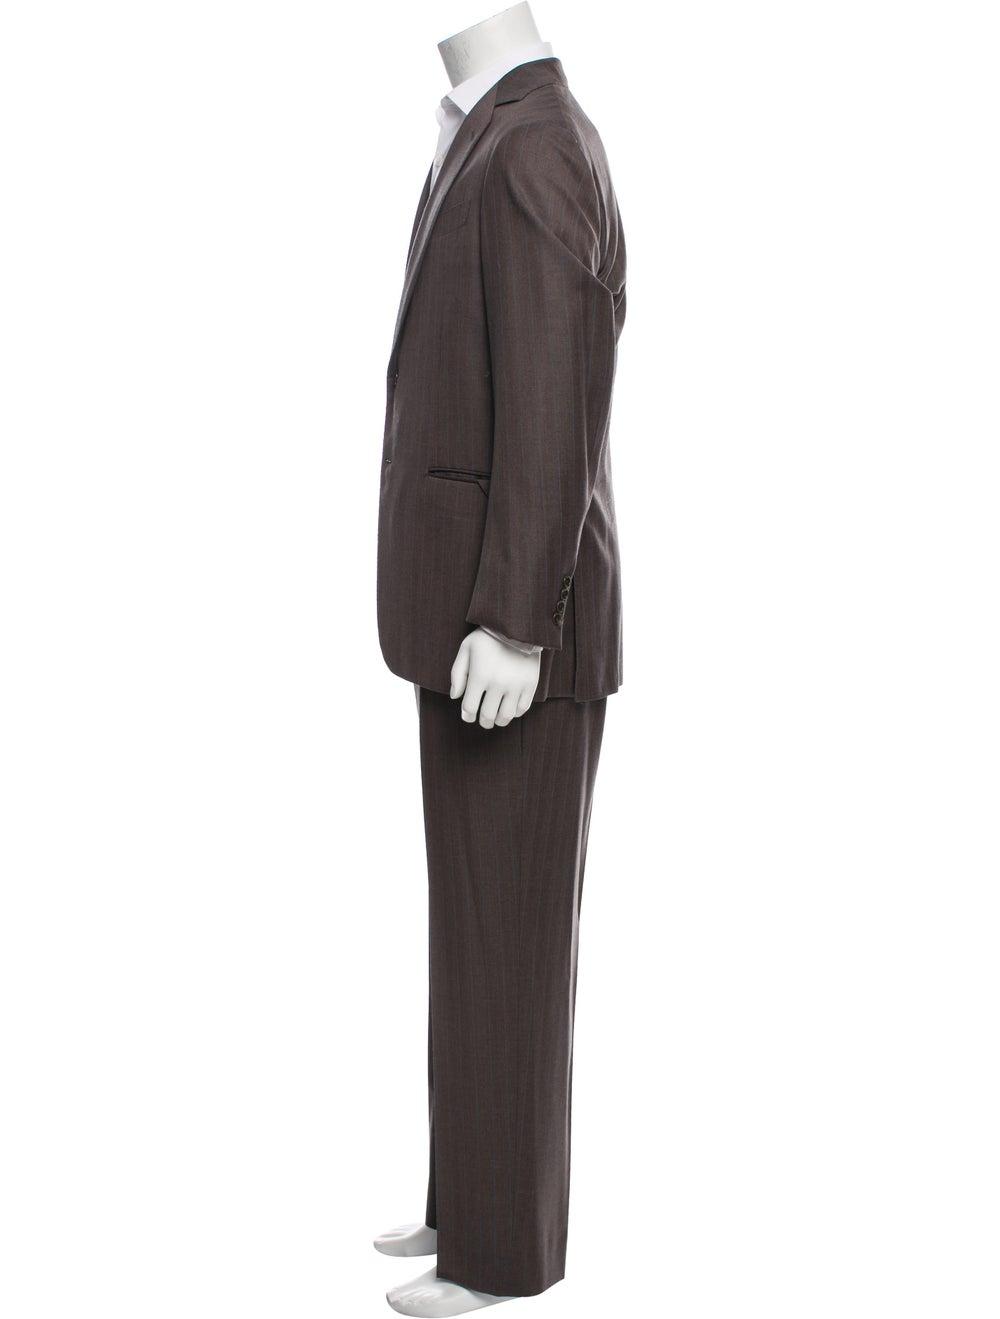 Battistoni Silk-Blend Pinstriped Two-Piece Suit - image 2